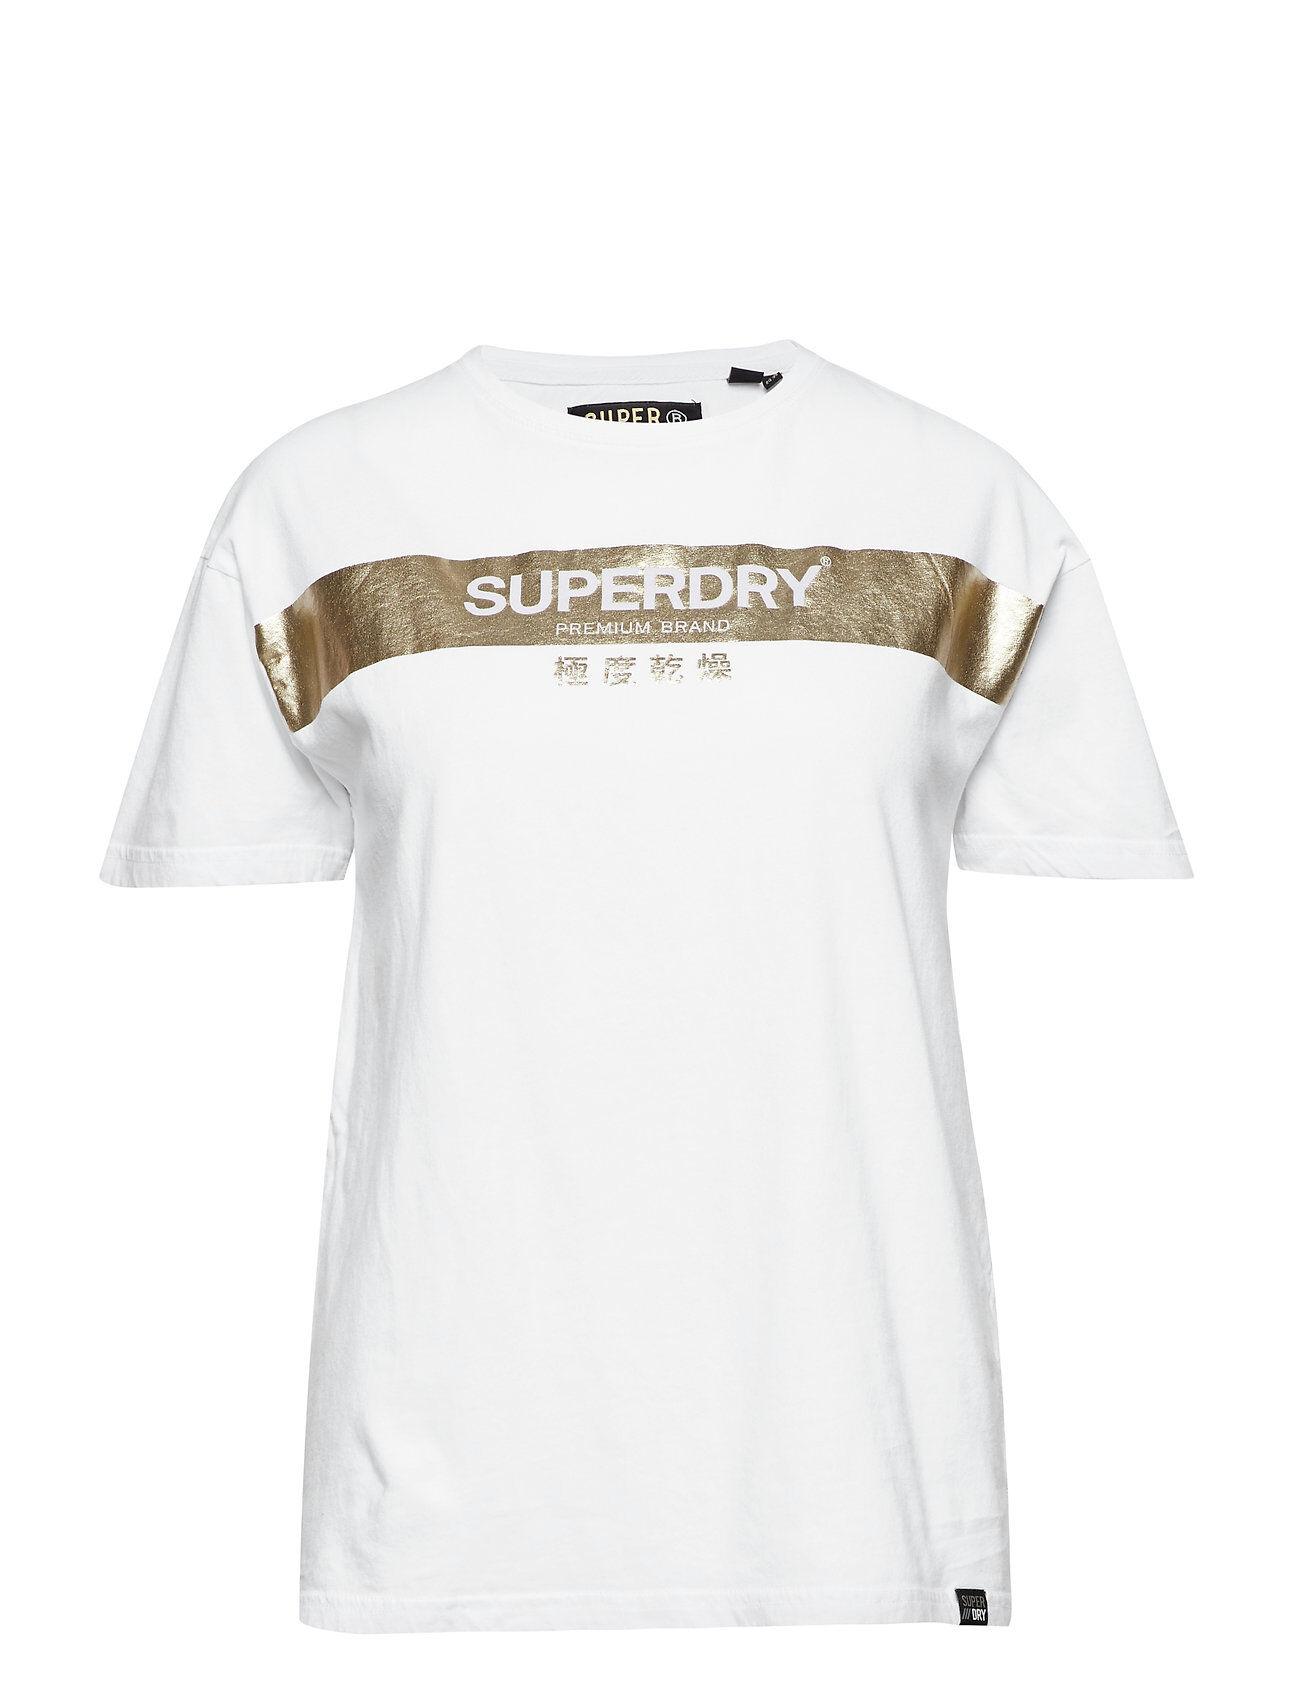 Superdry Premium Brand Foil Portland Tee